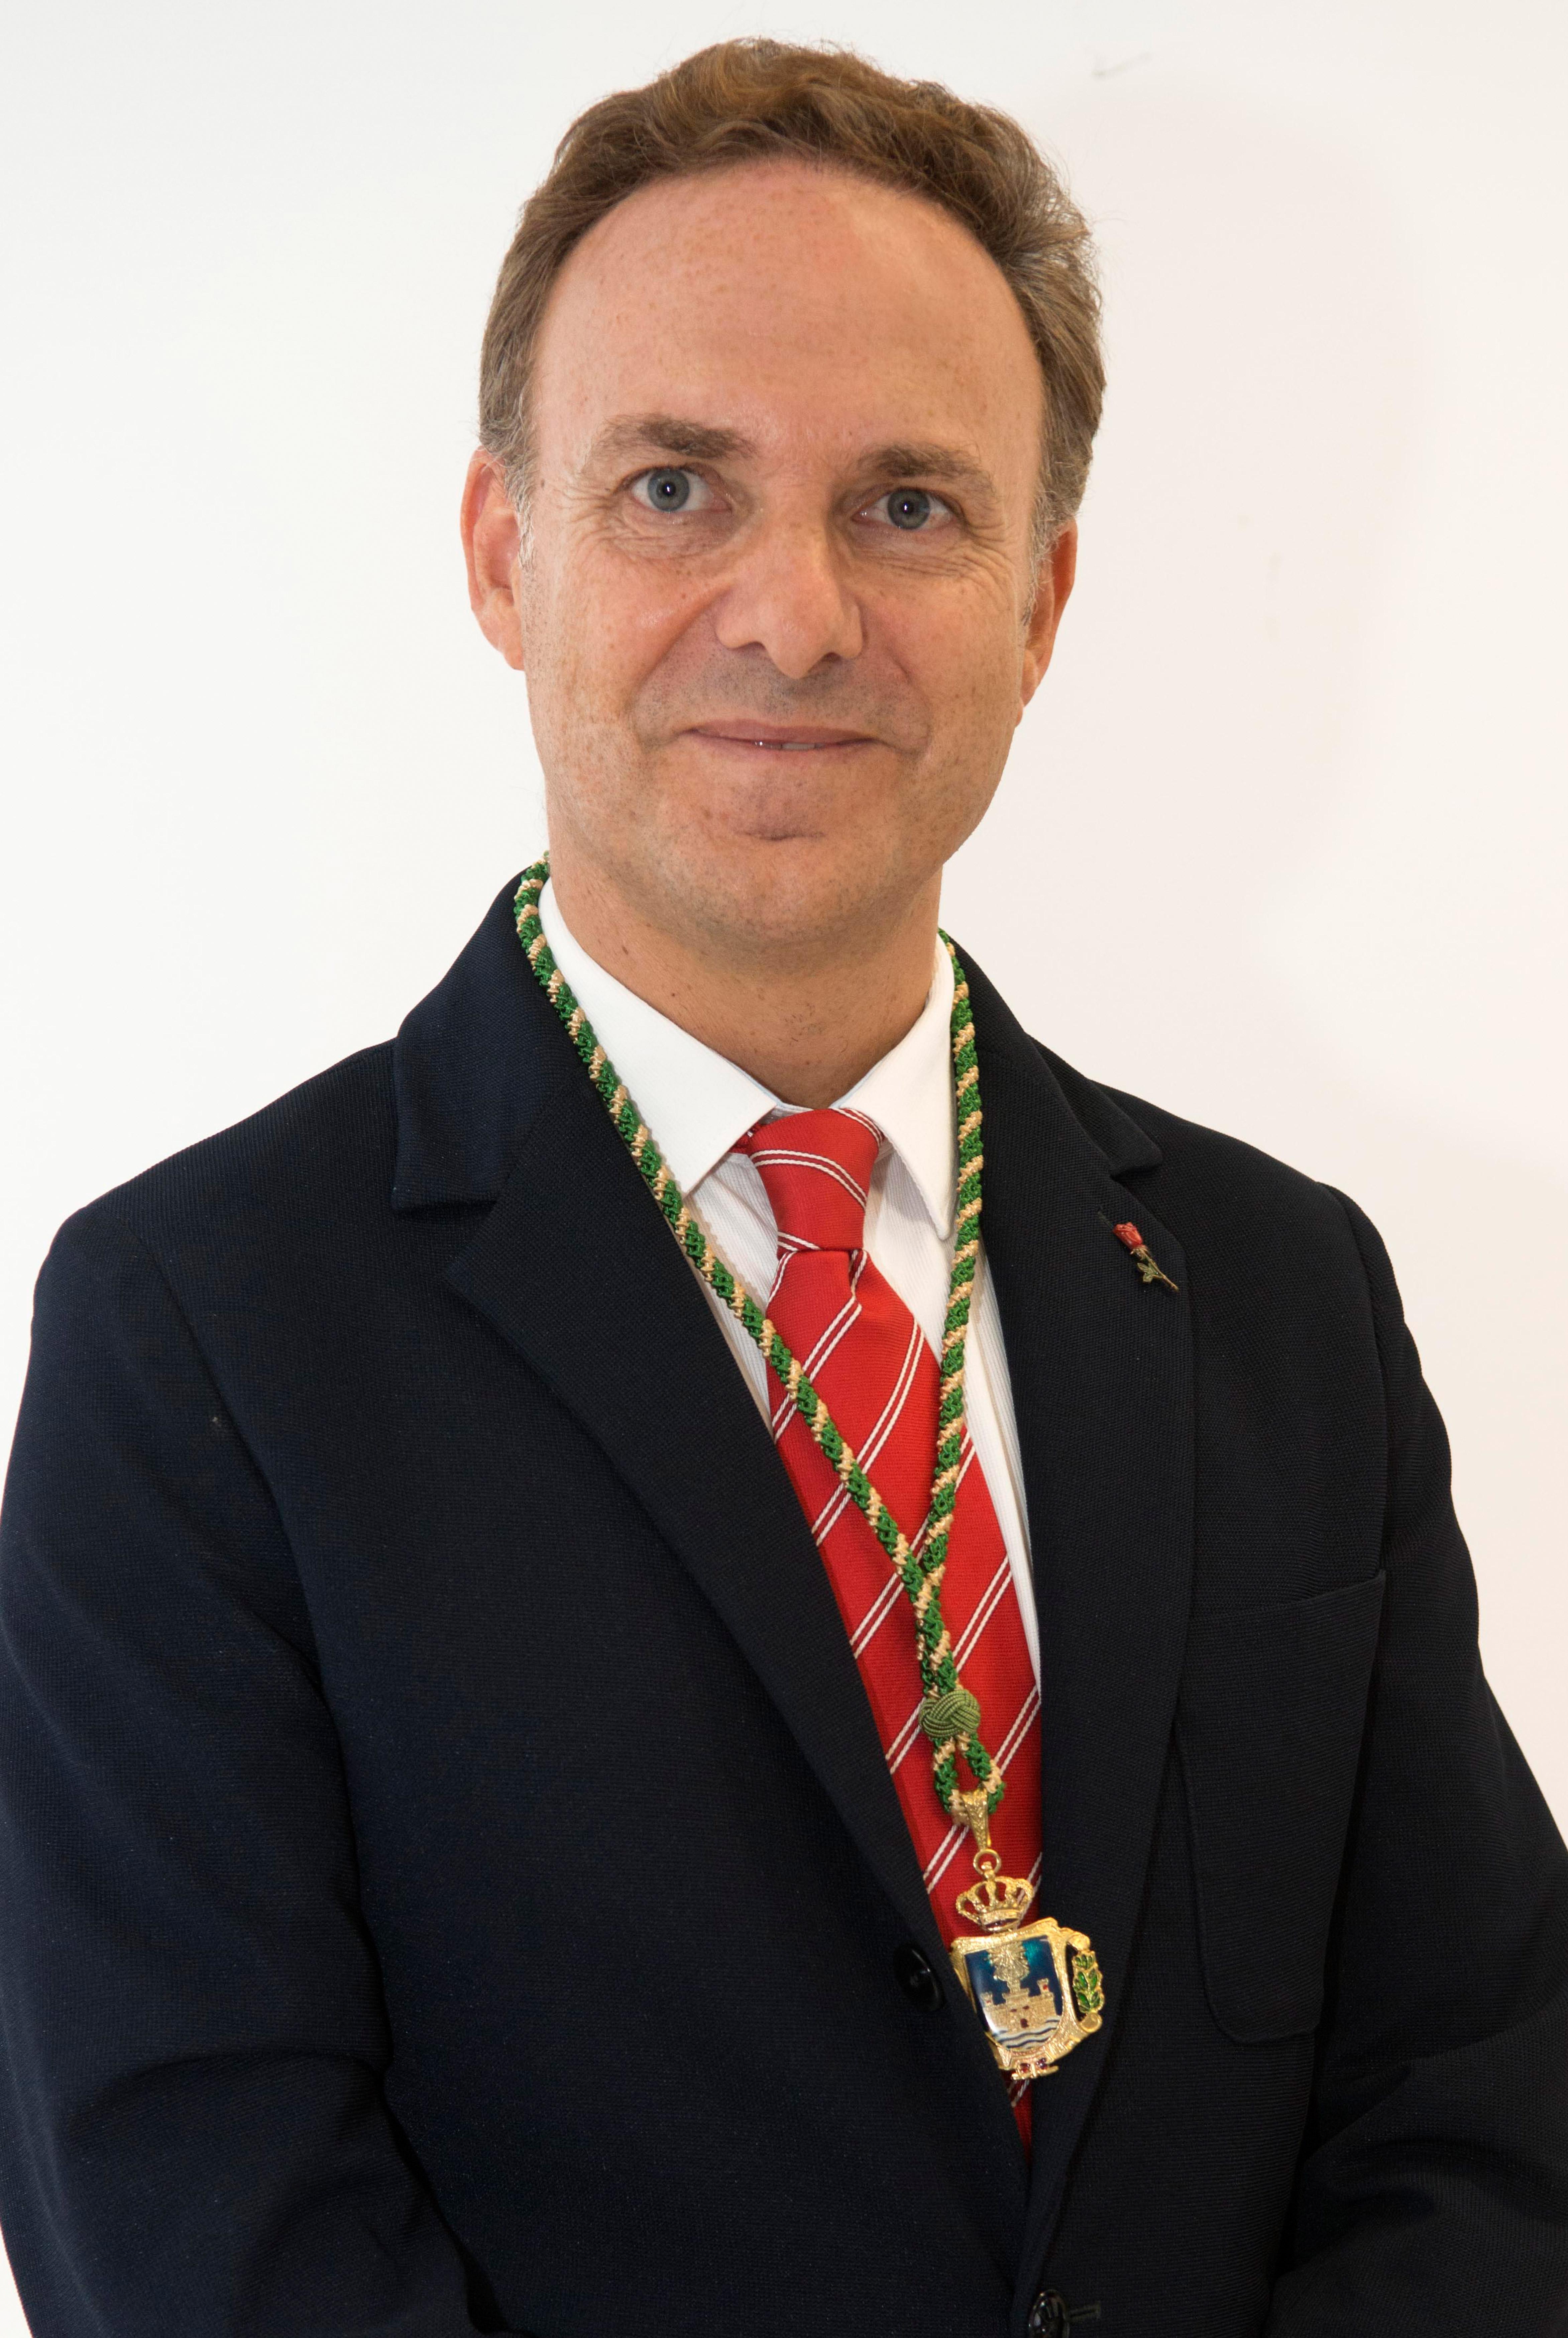 Javier David de la Encina Ortega